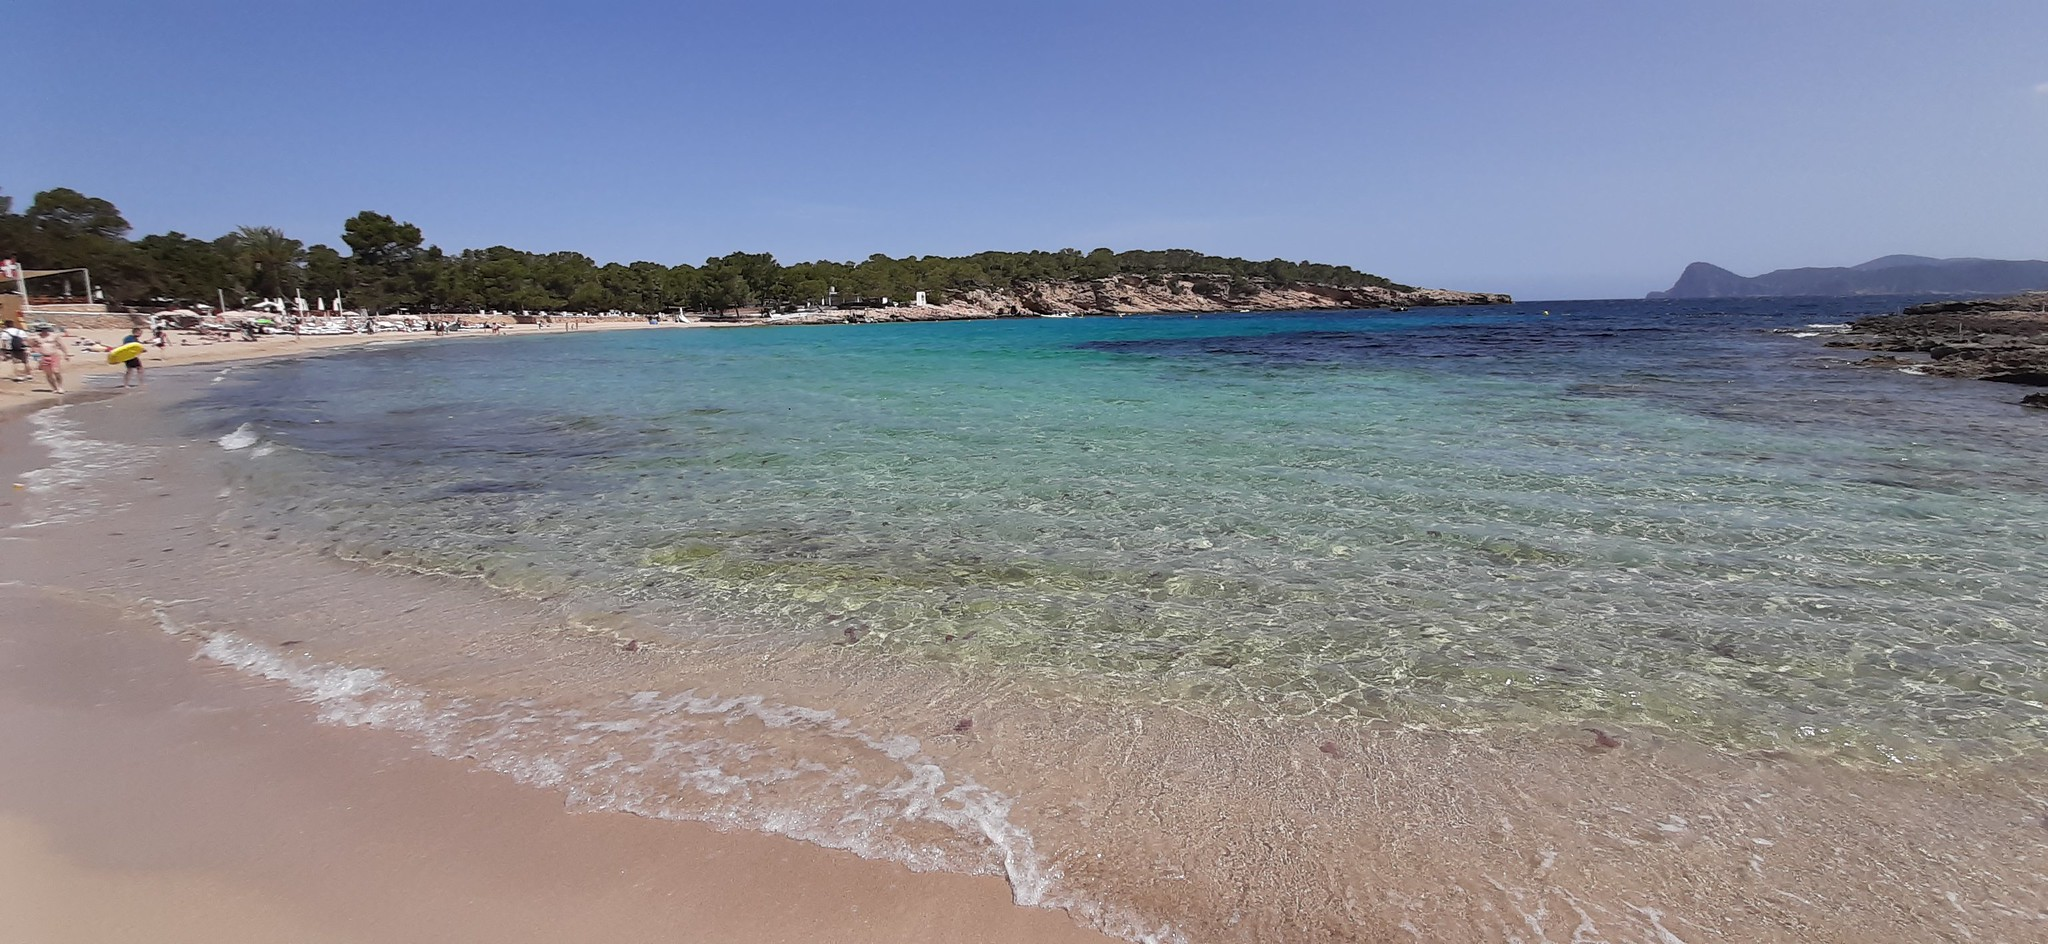 Cala Bassa, Ibiza, 26 de mayo 2021